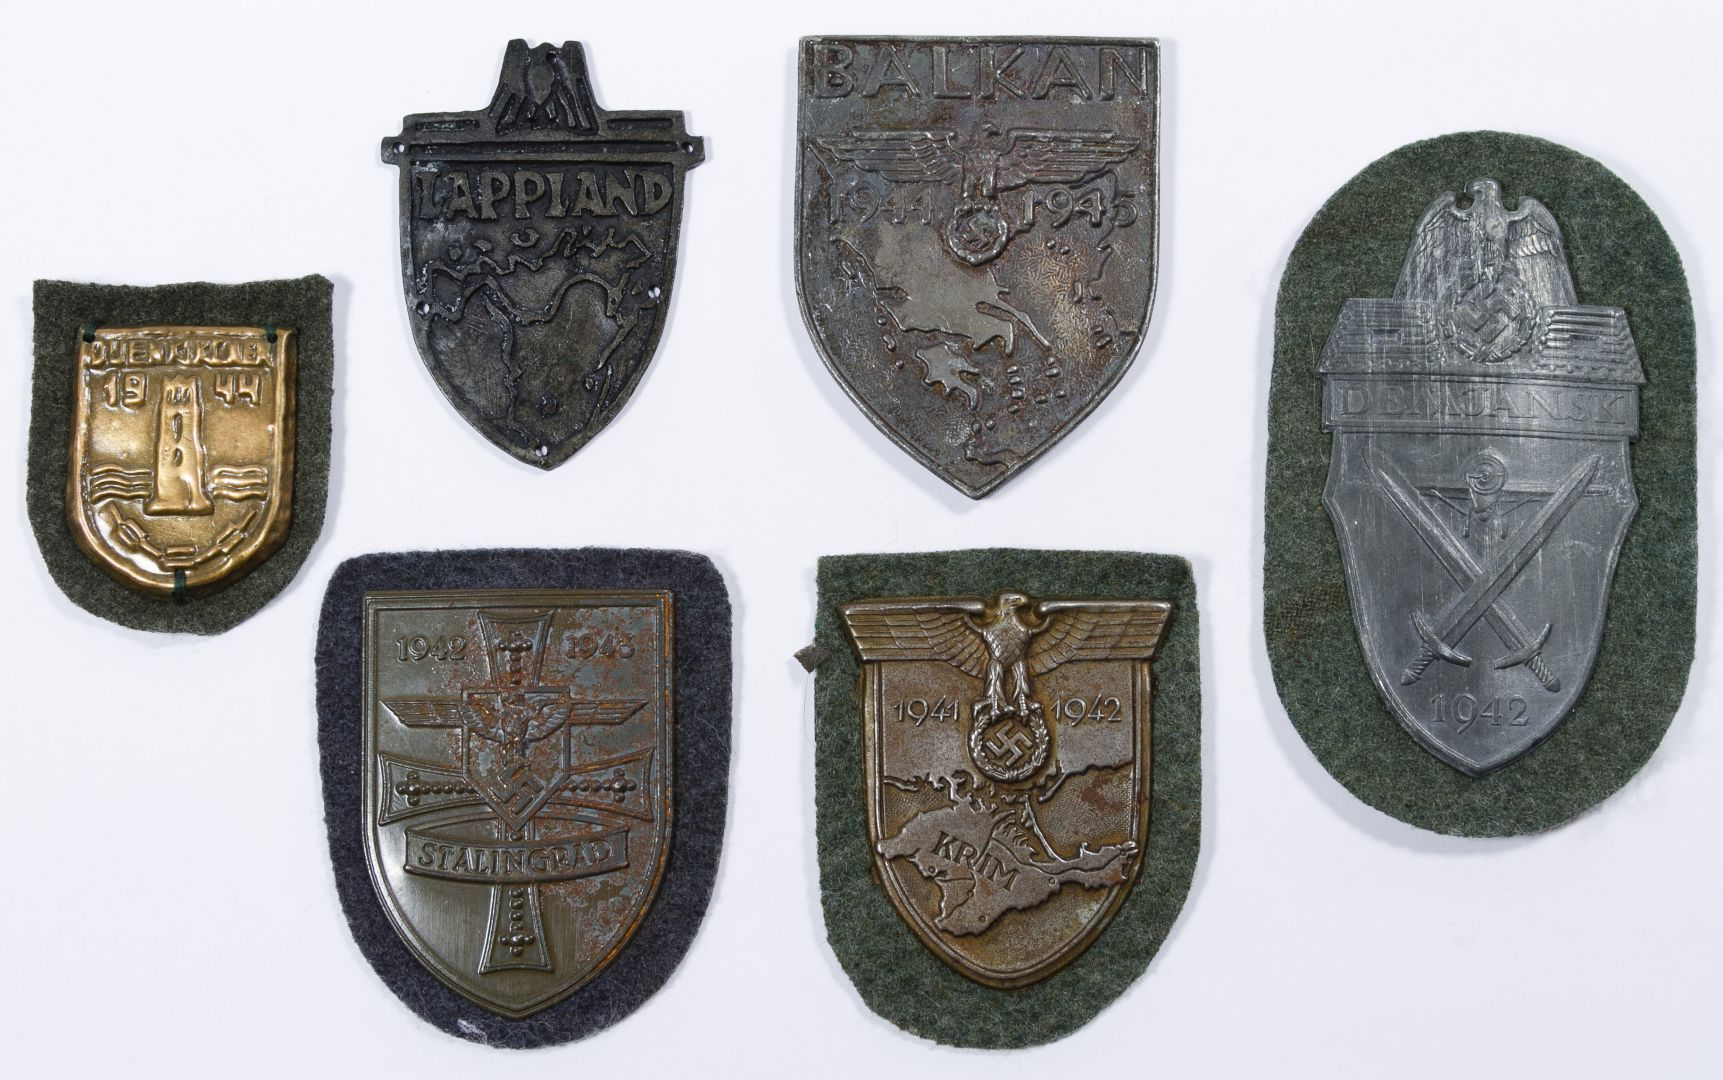 Lot 361: World War II German Sleeve Shield Assortment; Six Nazi items including Lappland, Balkan, Krim, Stalingrad, Demjansk and a small 1944 campaign shield